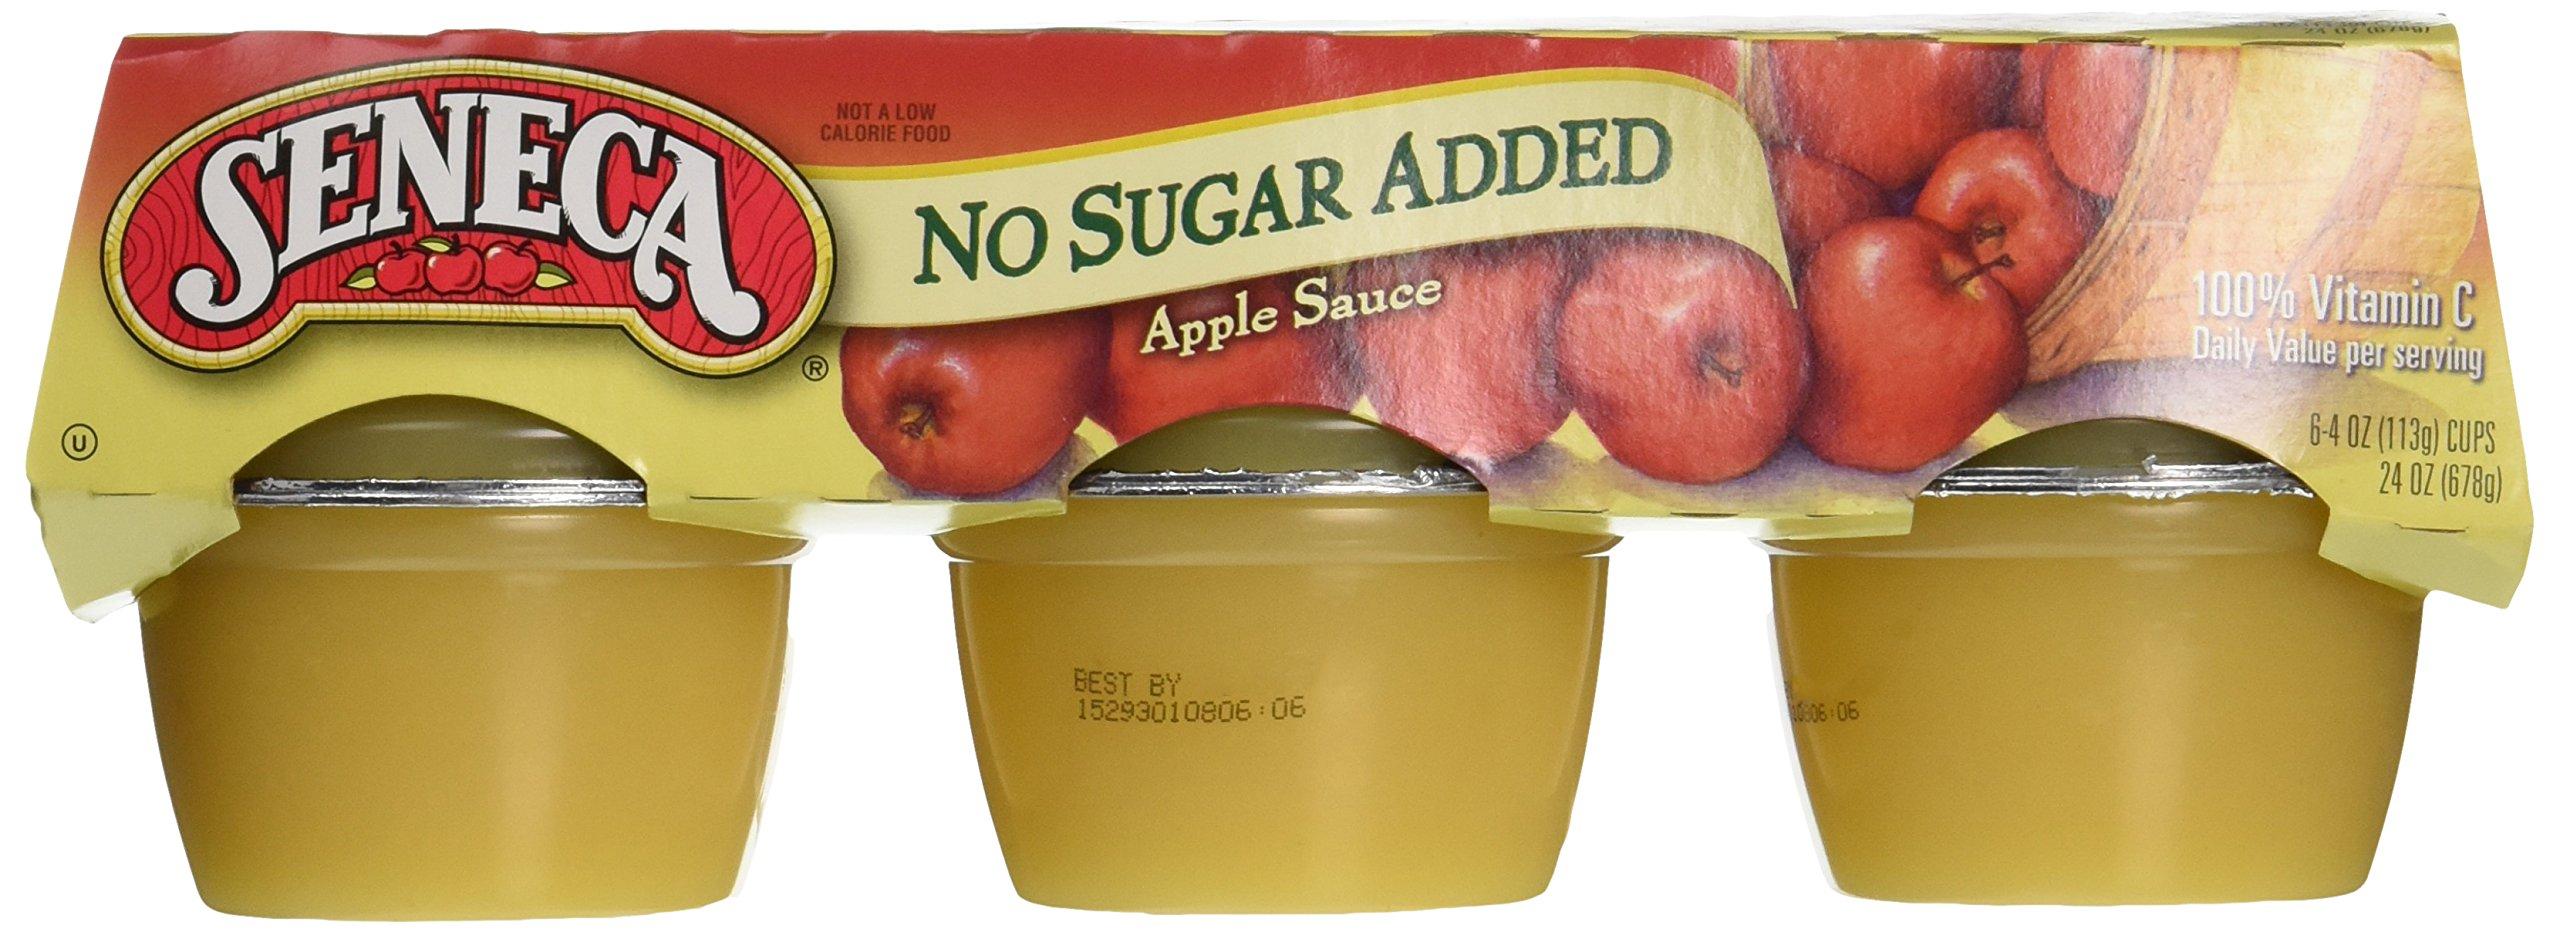 Seneca Apple Sauce, 100% Natural, No Sugar Added, 6 pk, 4 oz